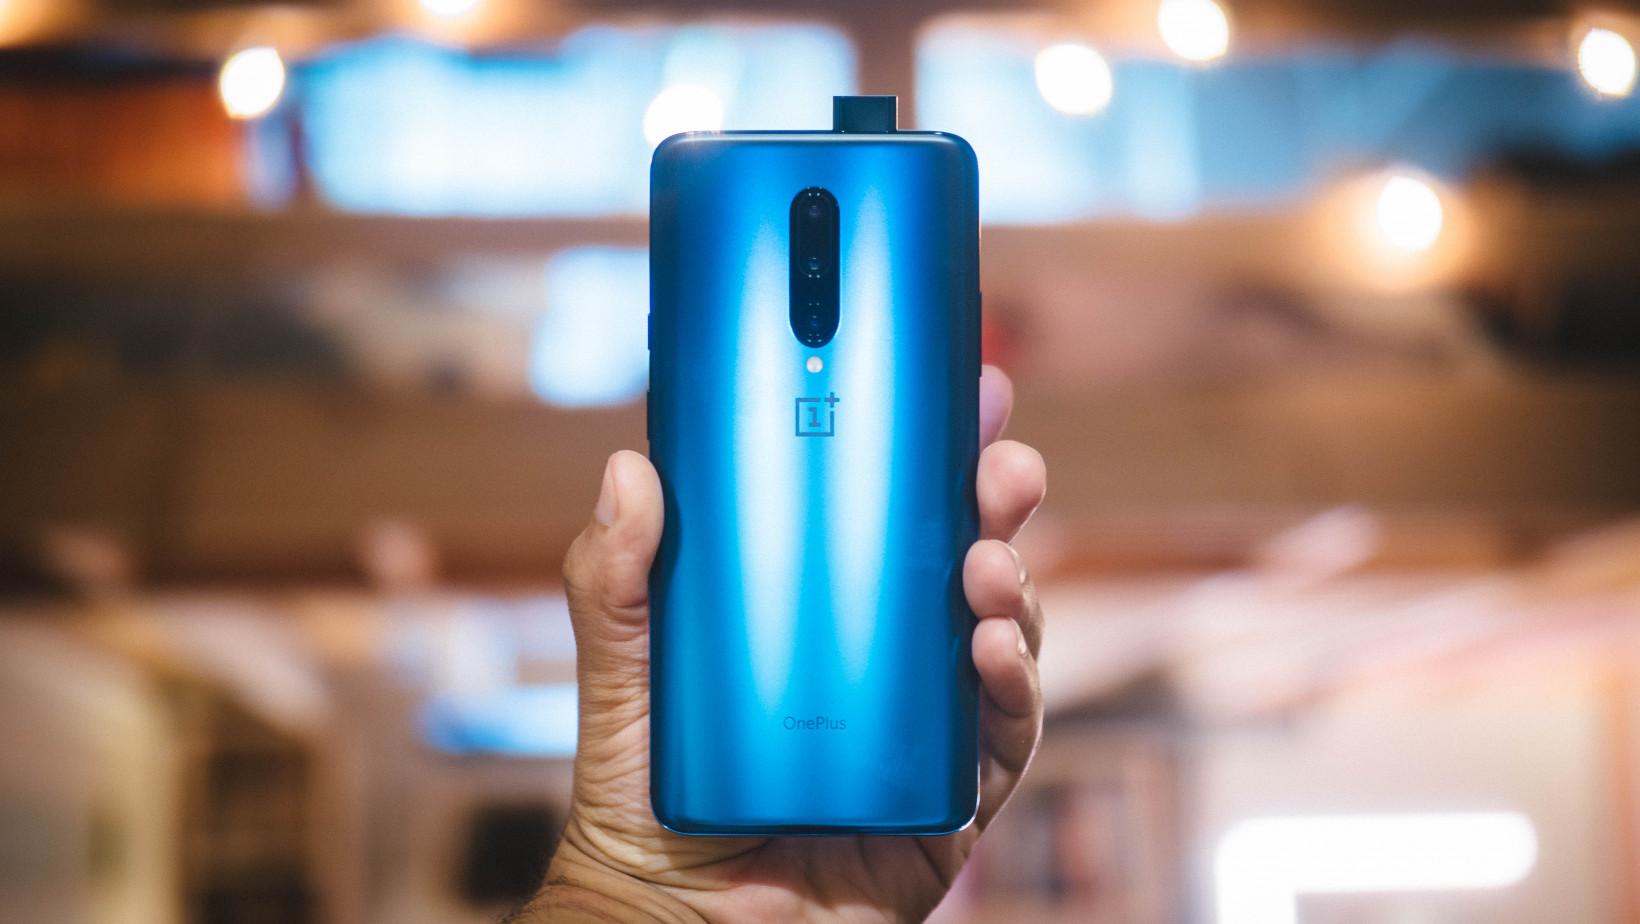 The OnePlus 7T arrives on September 26